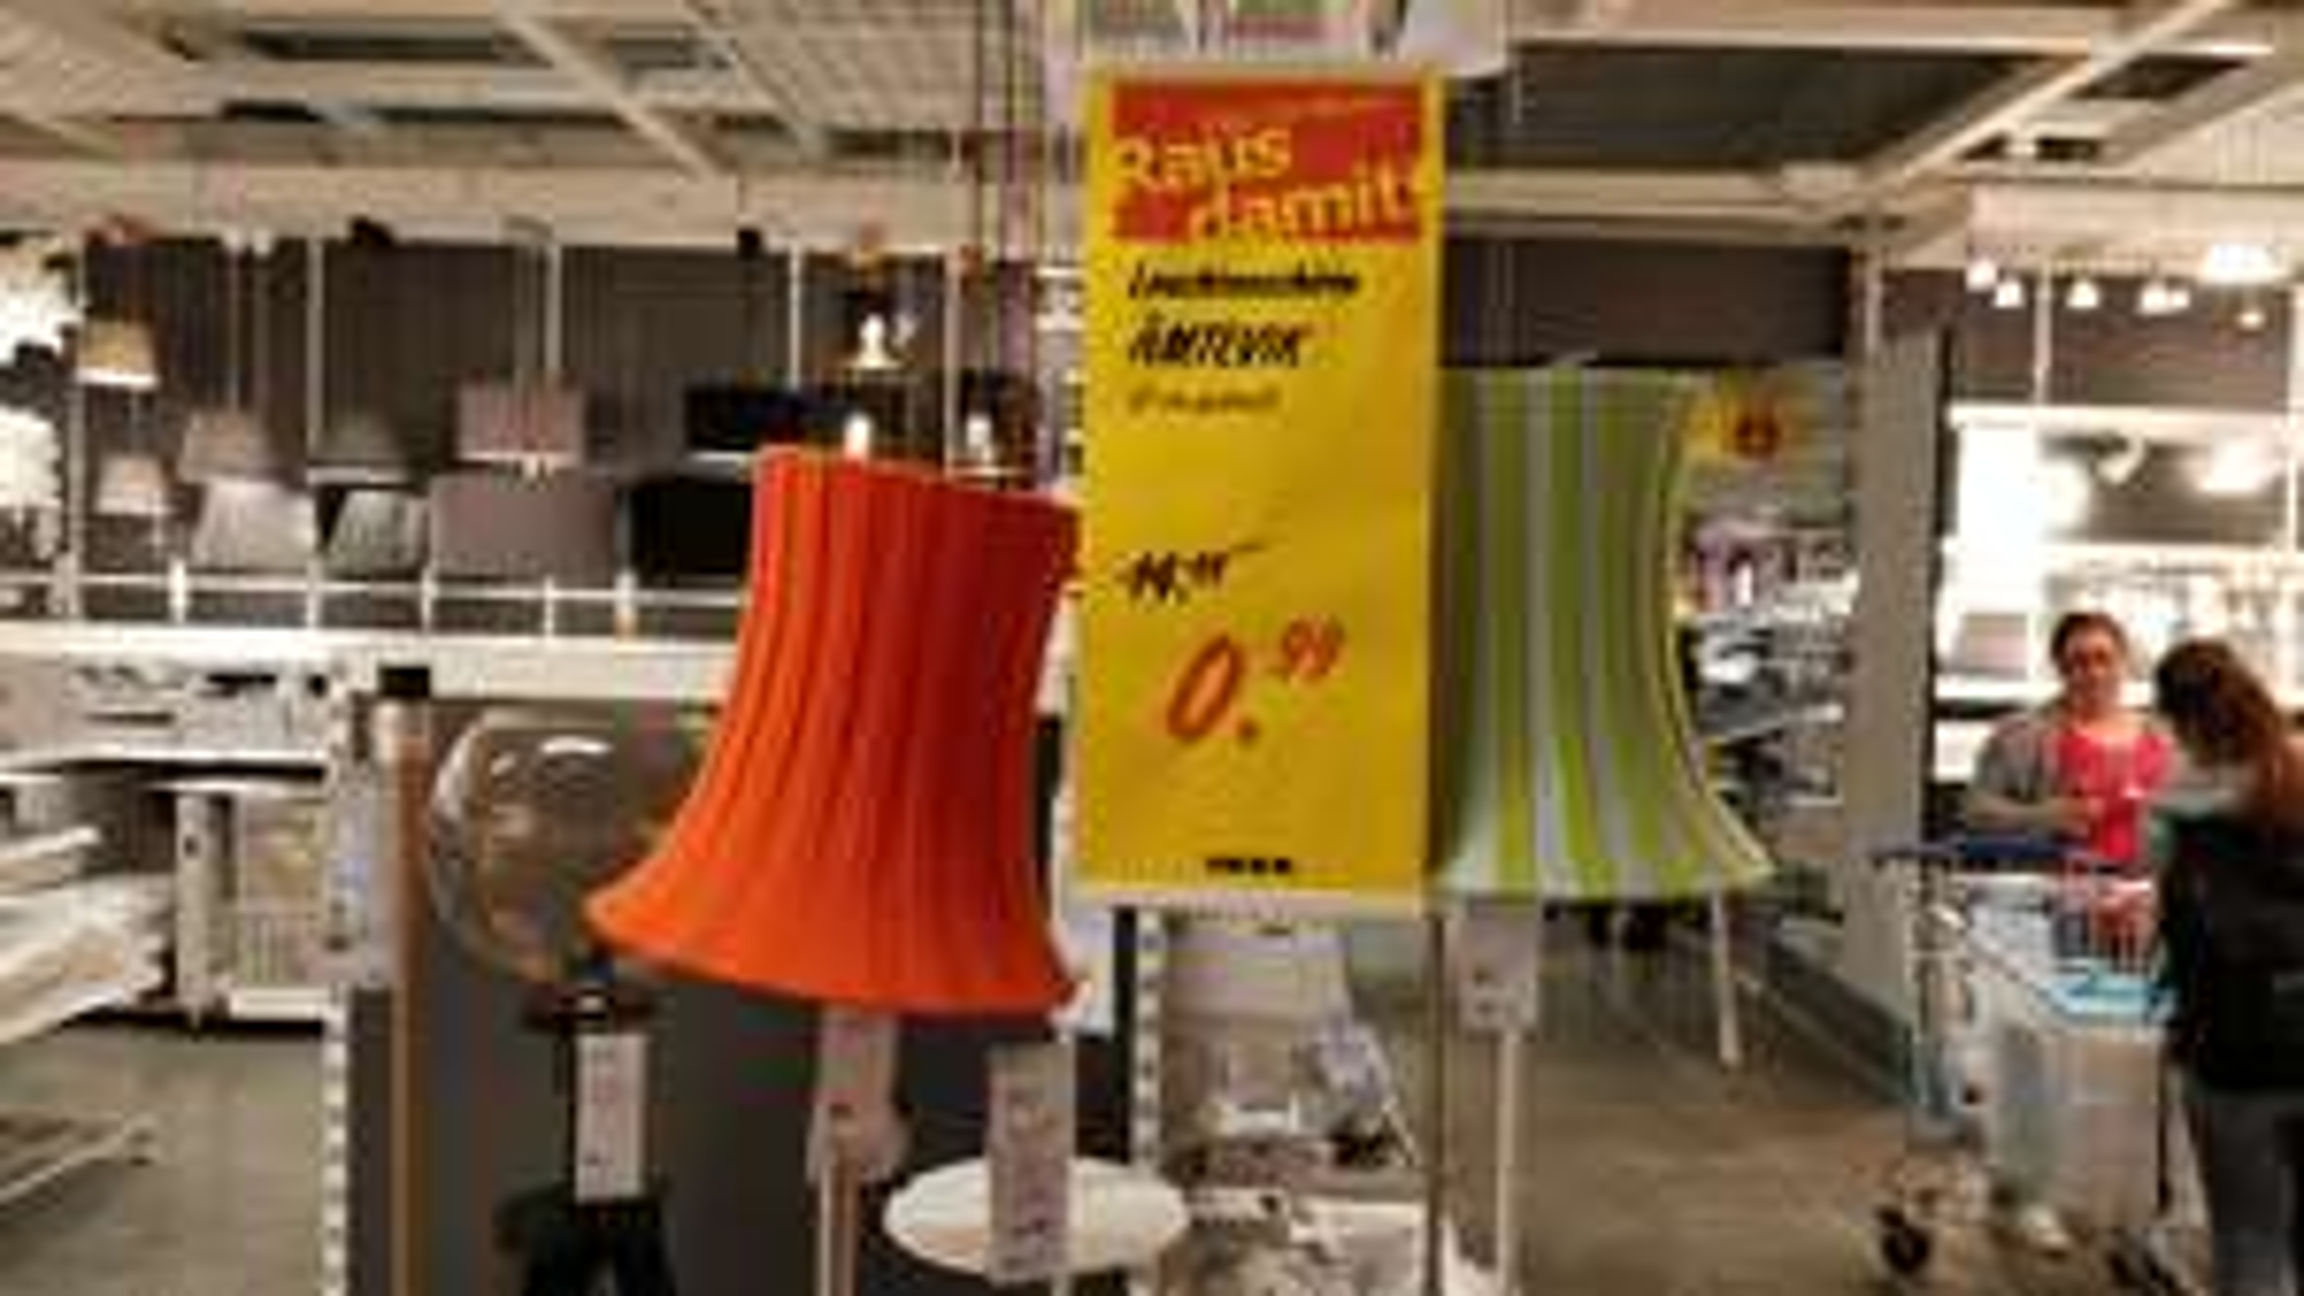 [IKEA Duisburg] Leuchtenschirm ÄMTEVIK